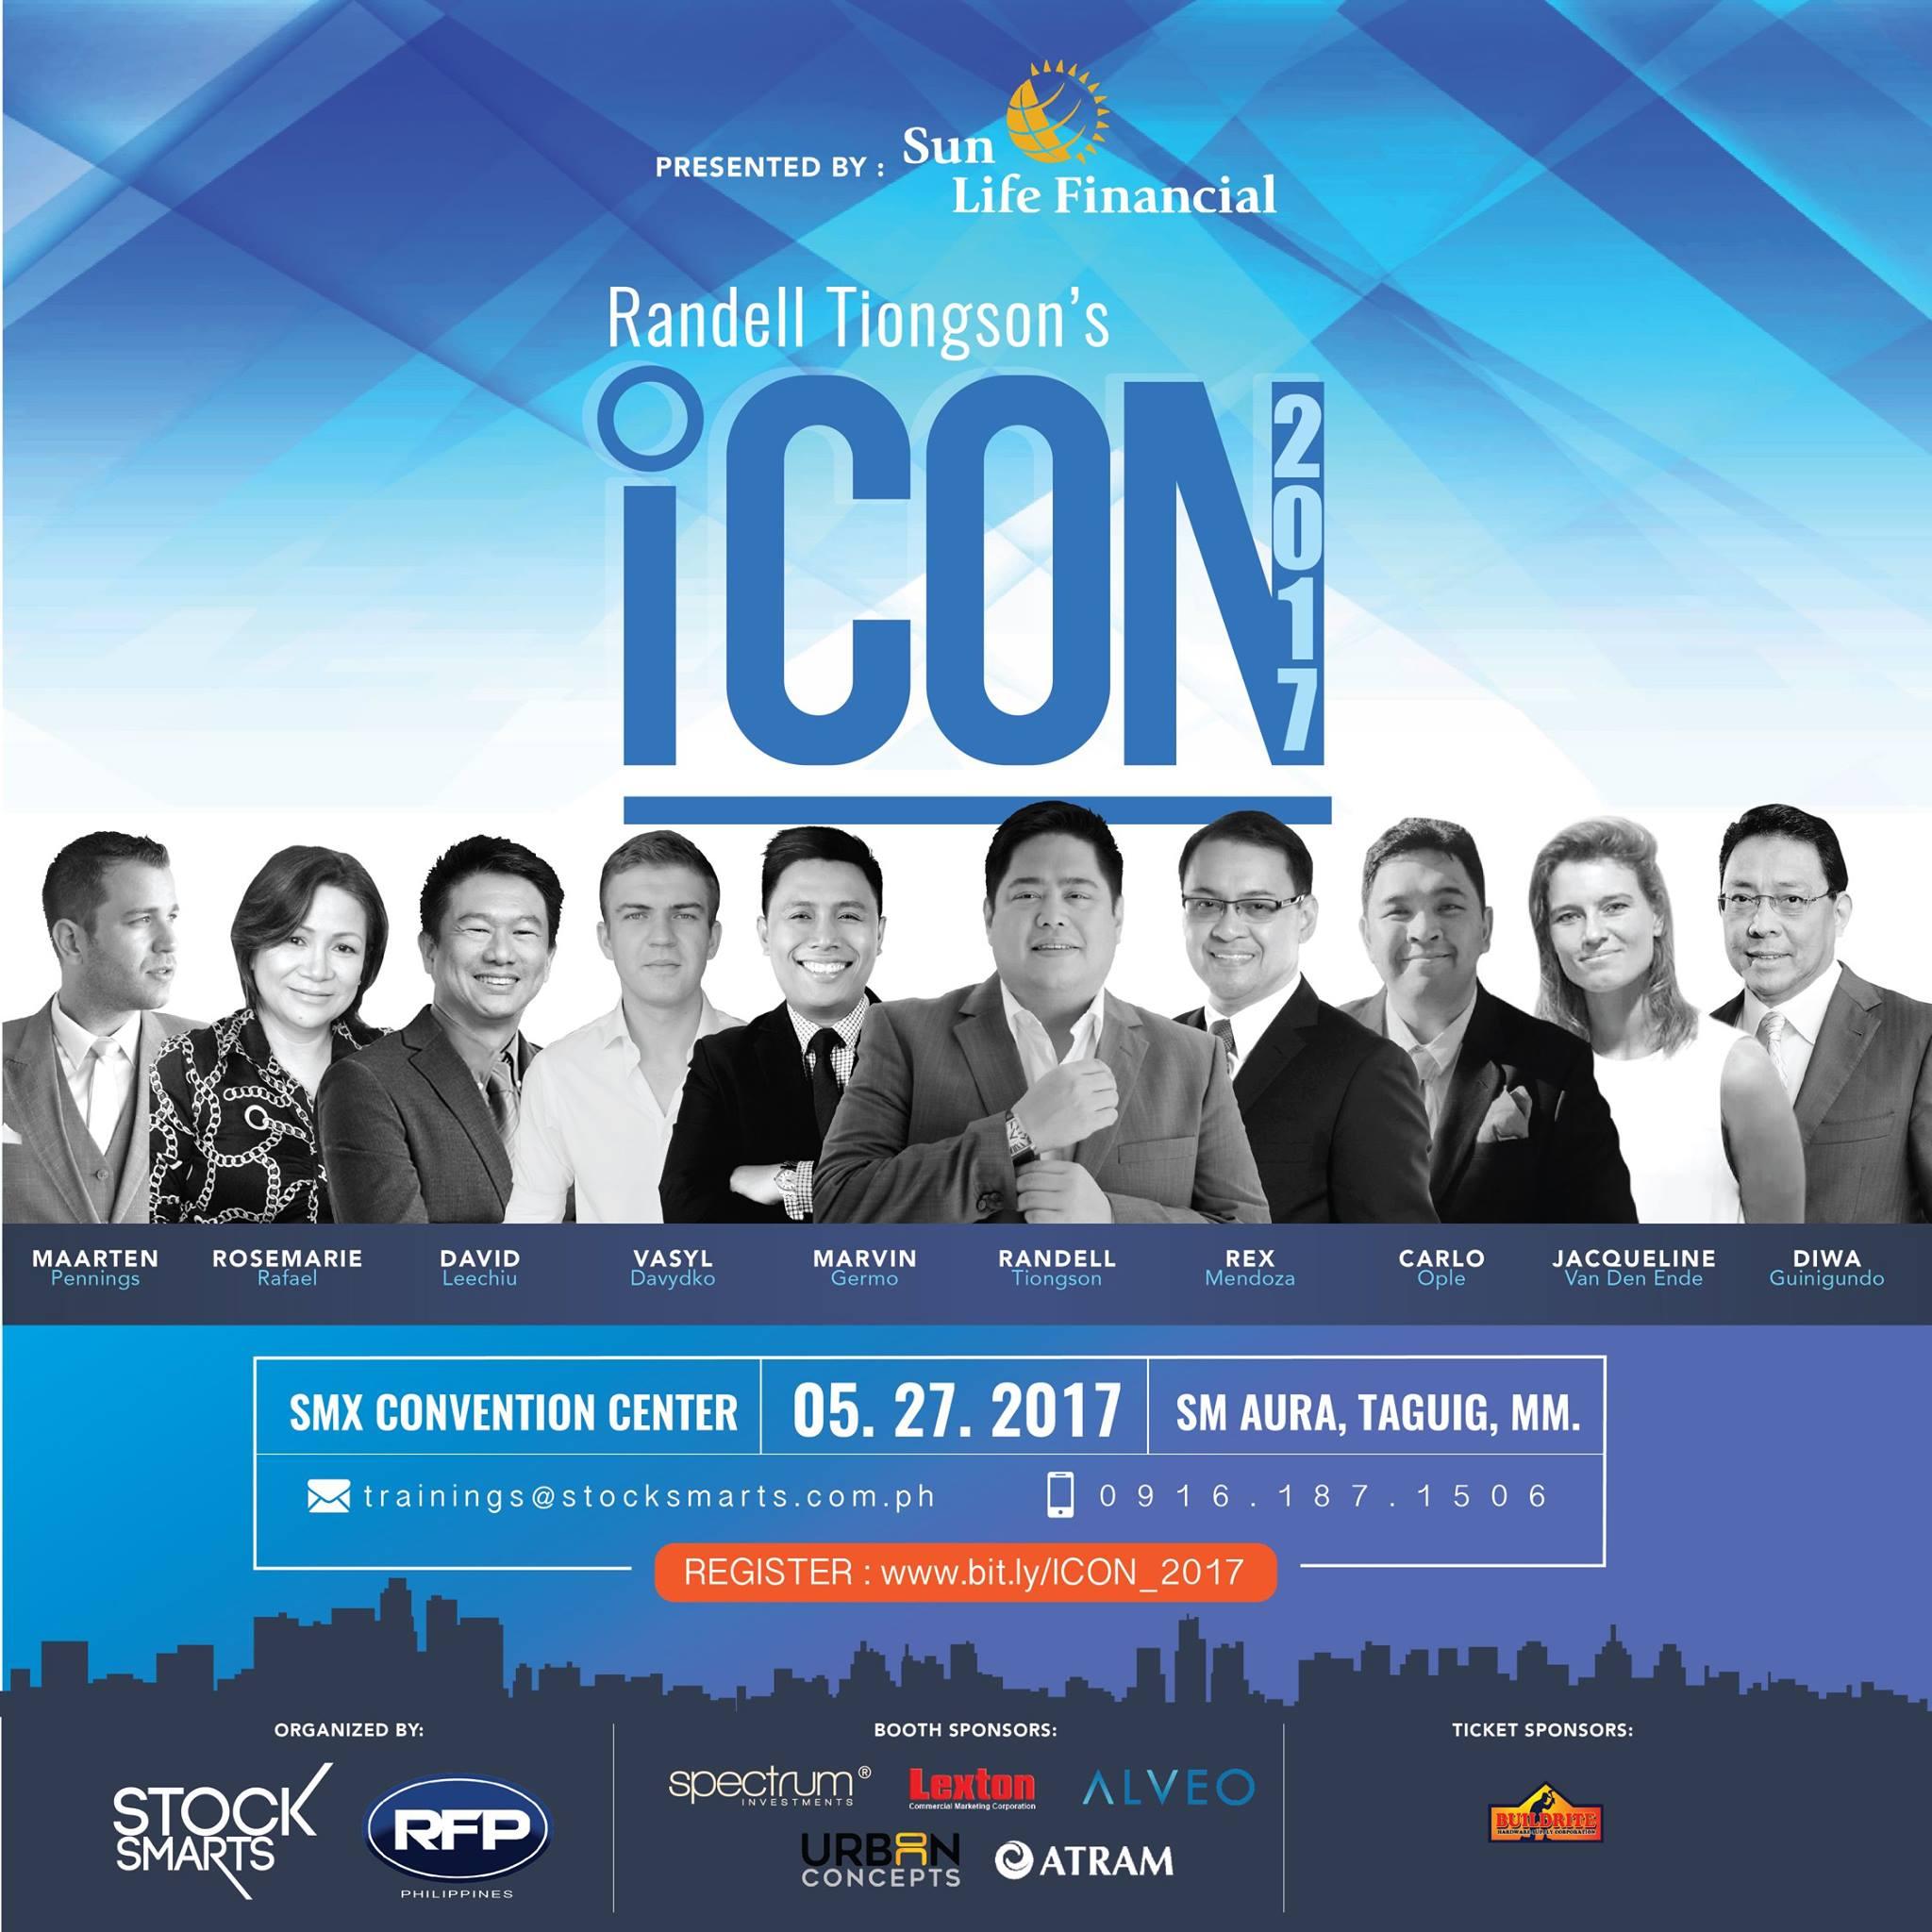 ICON 2017